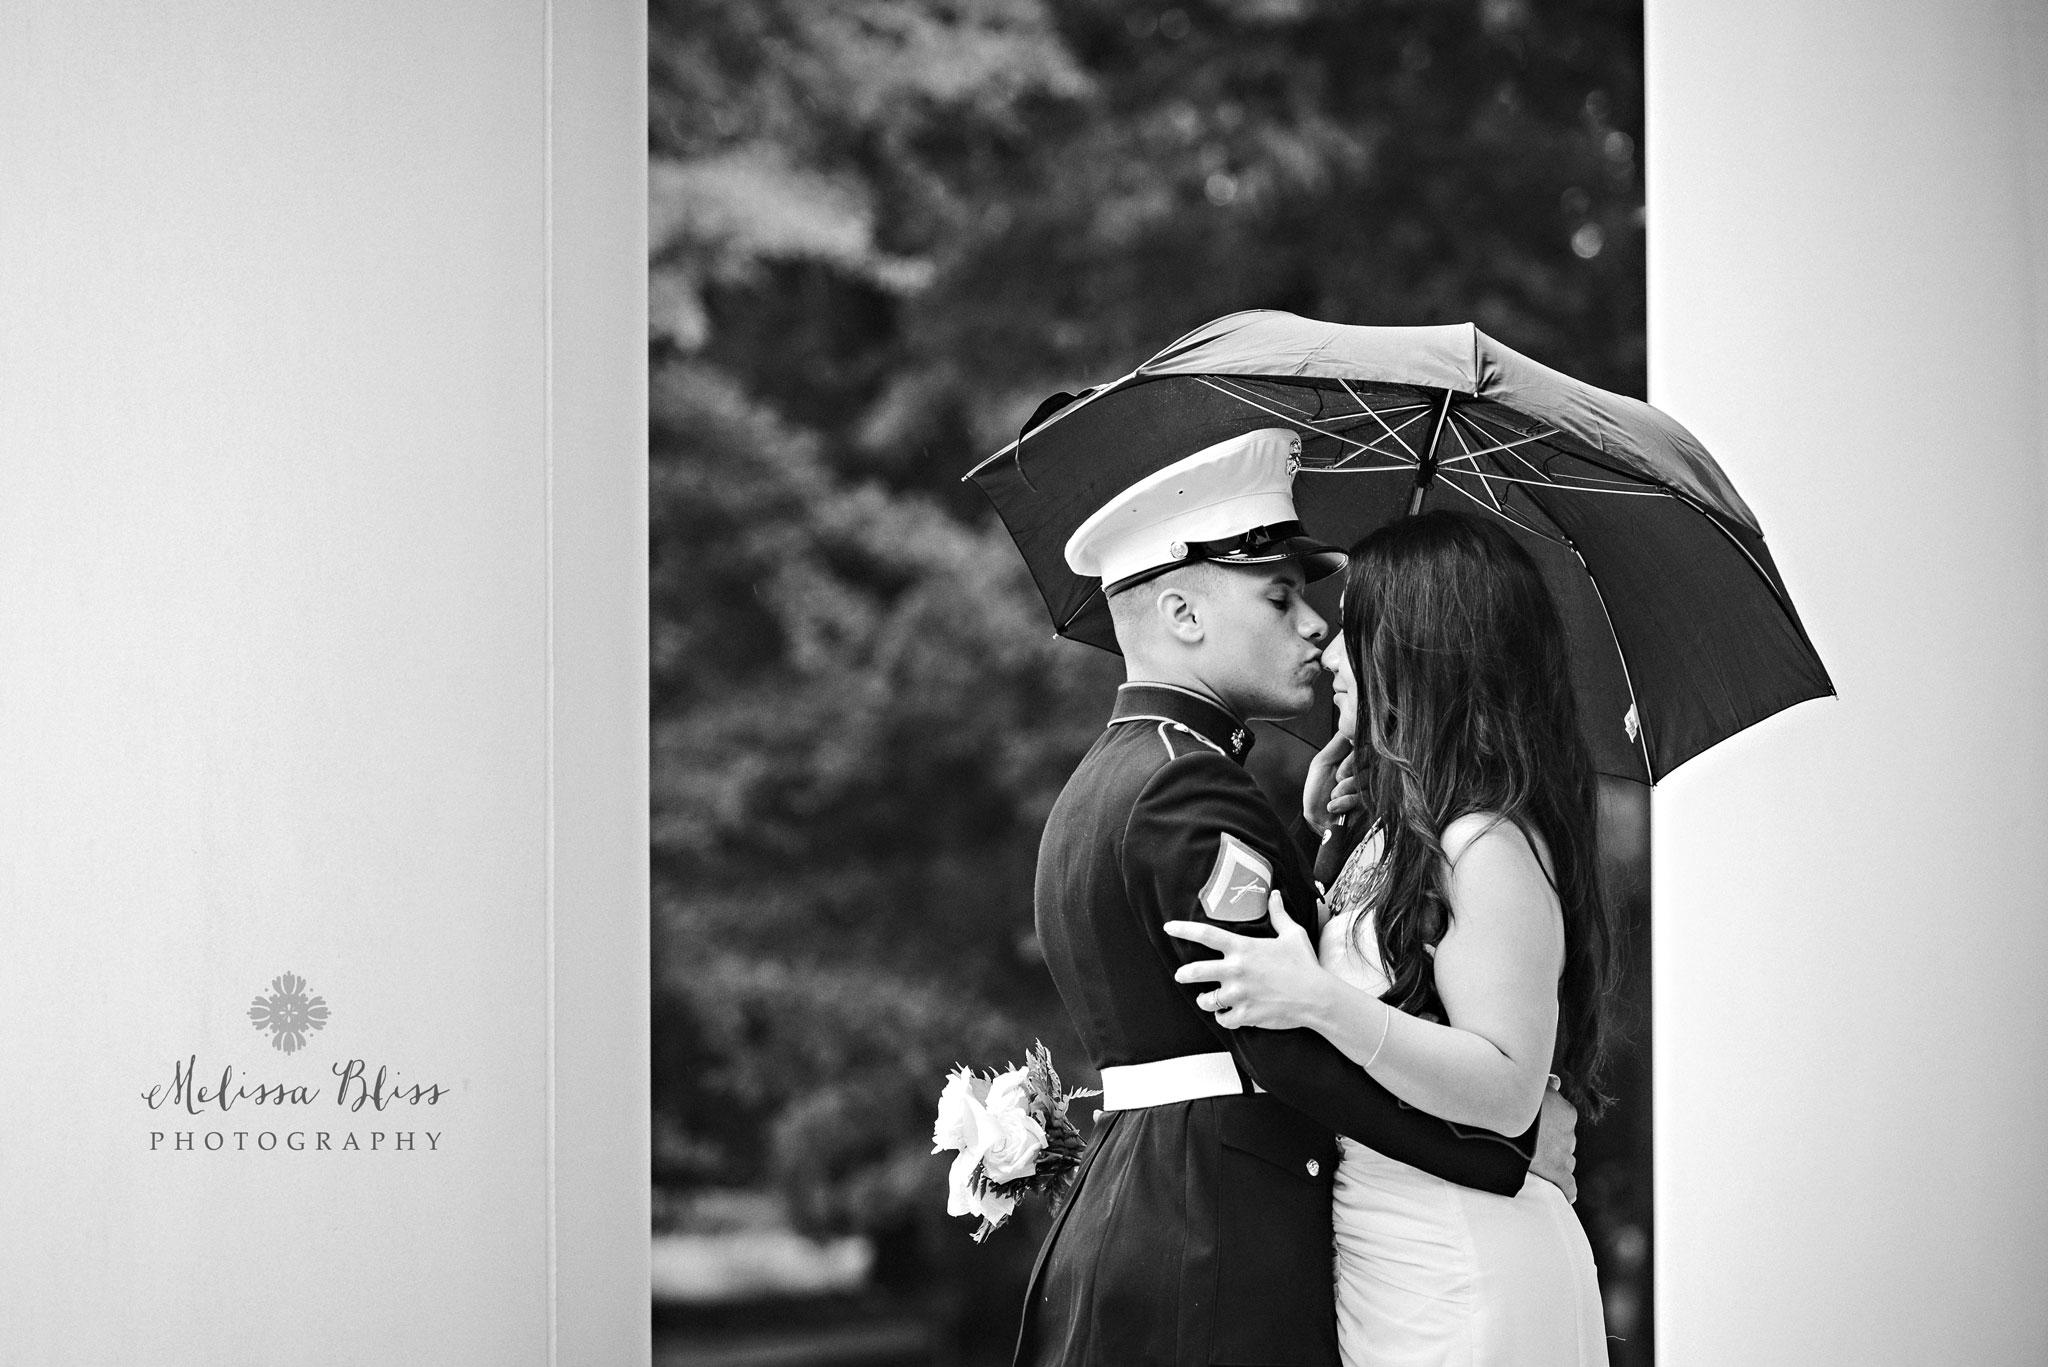 norfolk-wedding-photographer-portsmouth-chesapeake-suffolk-williamsburg-wedding-photography-melissa-bliss-photography-va-beach-elopement